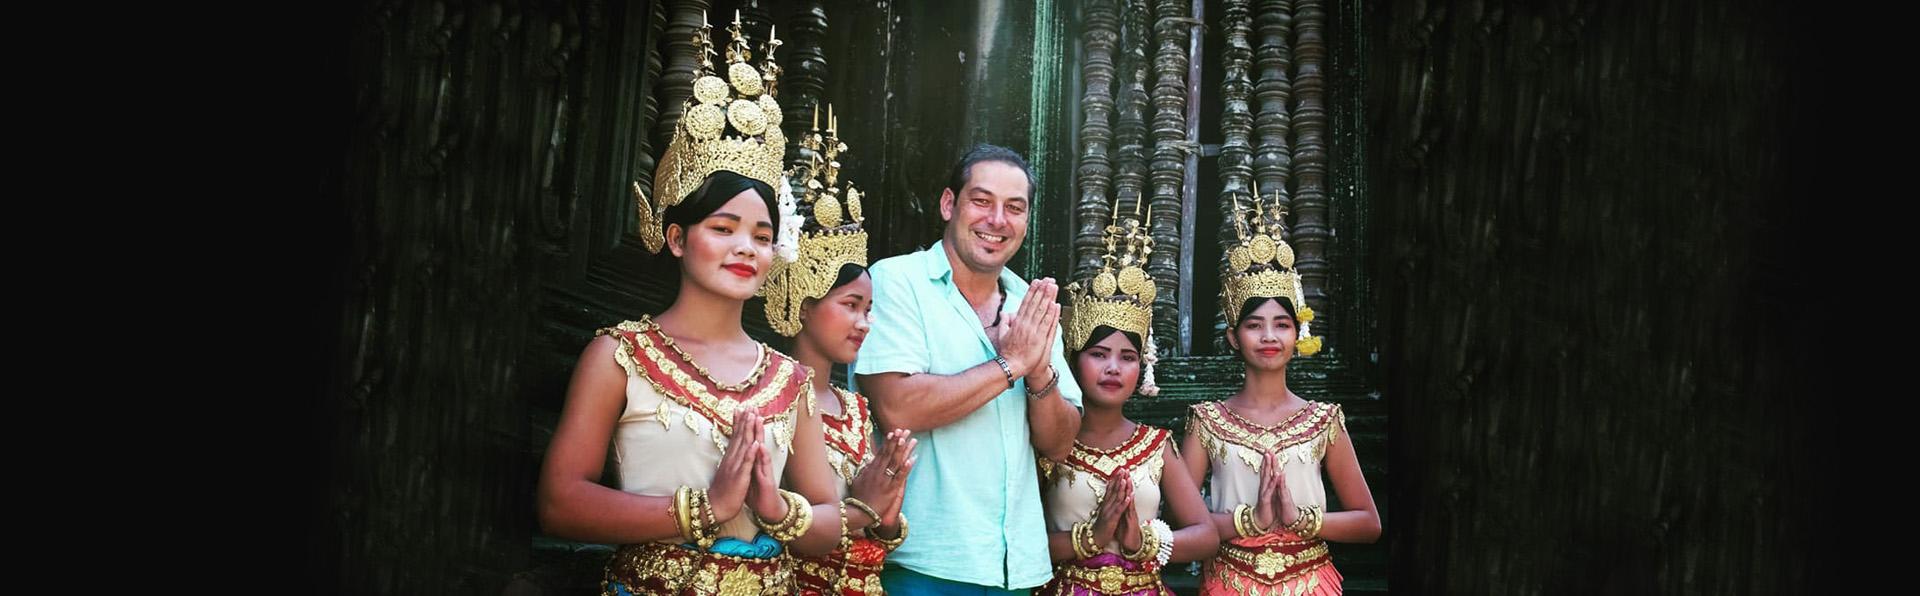 travel by dart cambodian girls